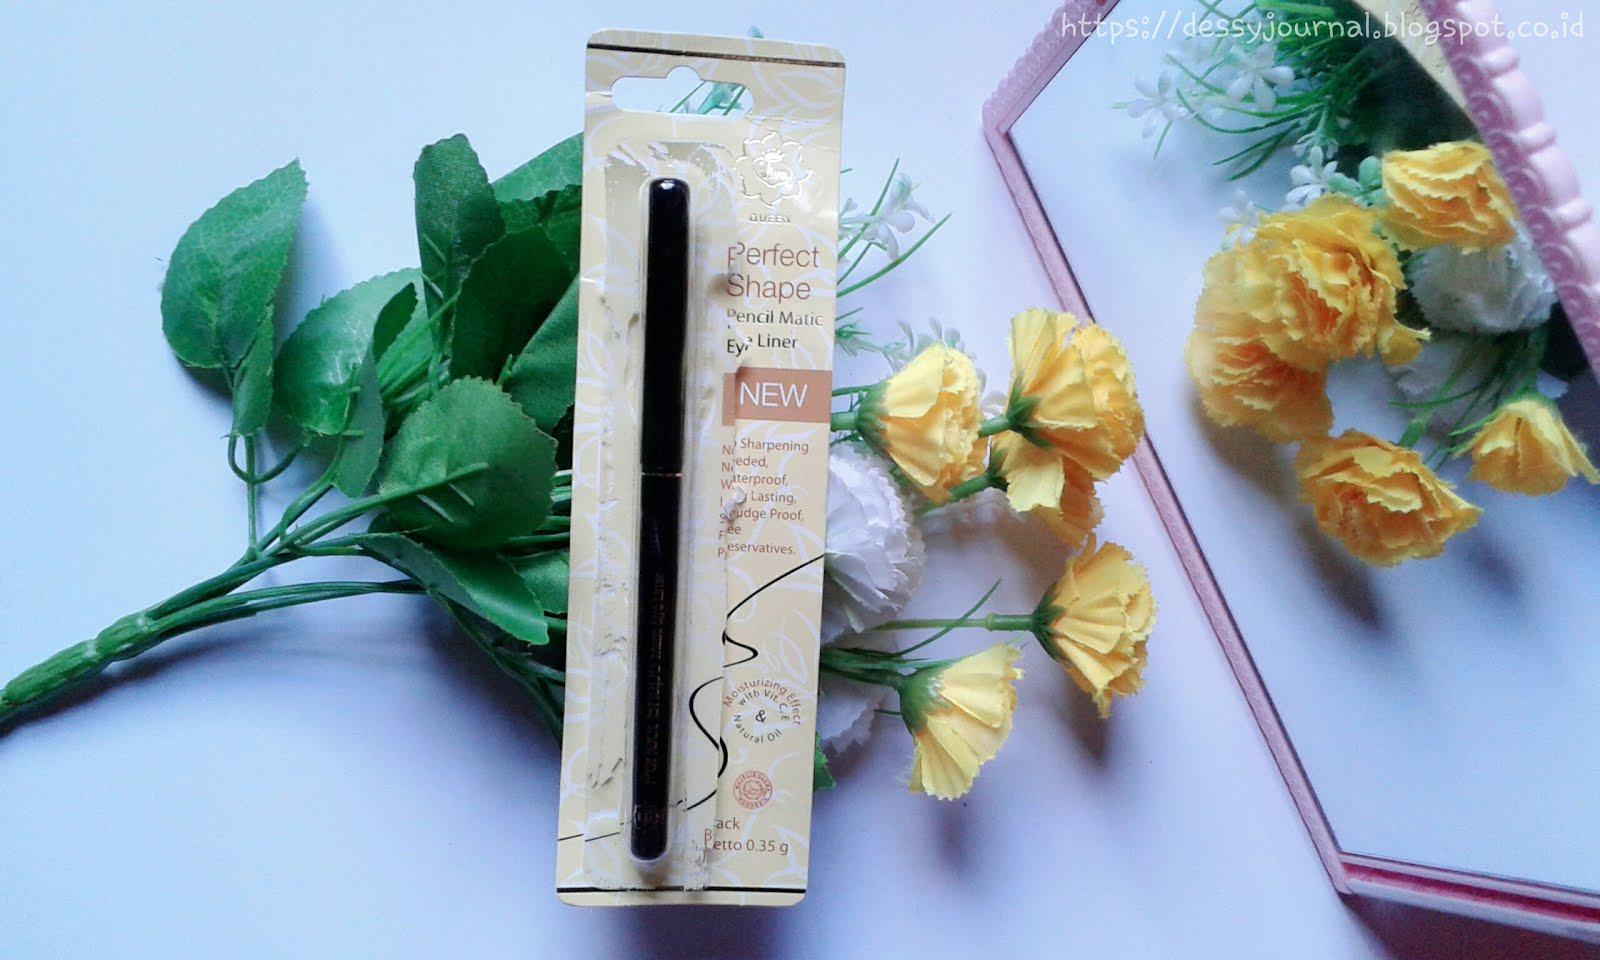 Dessy Journal Juni 2017 Viva Queen Perfect Shape Pencil Matic Eye Liner 035 Ml Hitam Review Black